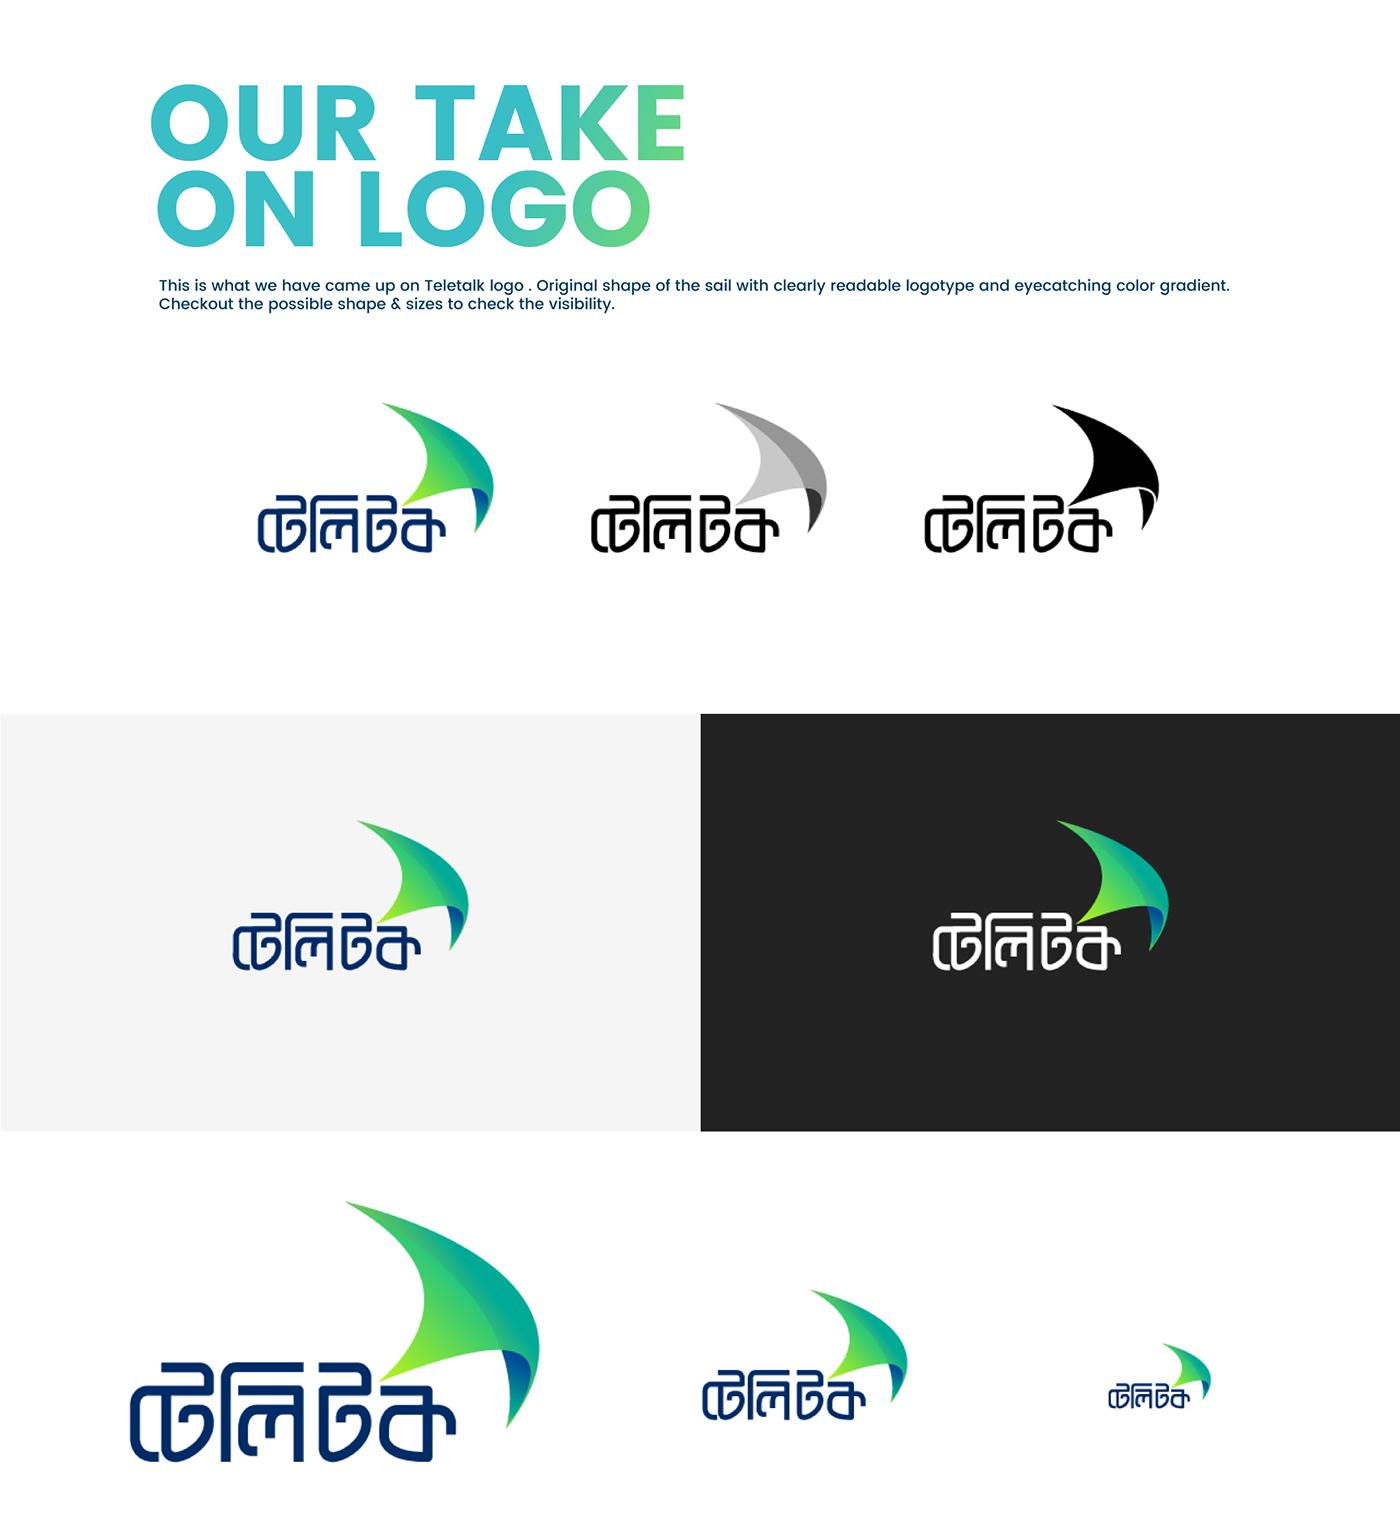 teletalk maniknratan Bangladesh logo design concept Telecom branding  corporateidentity